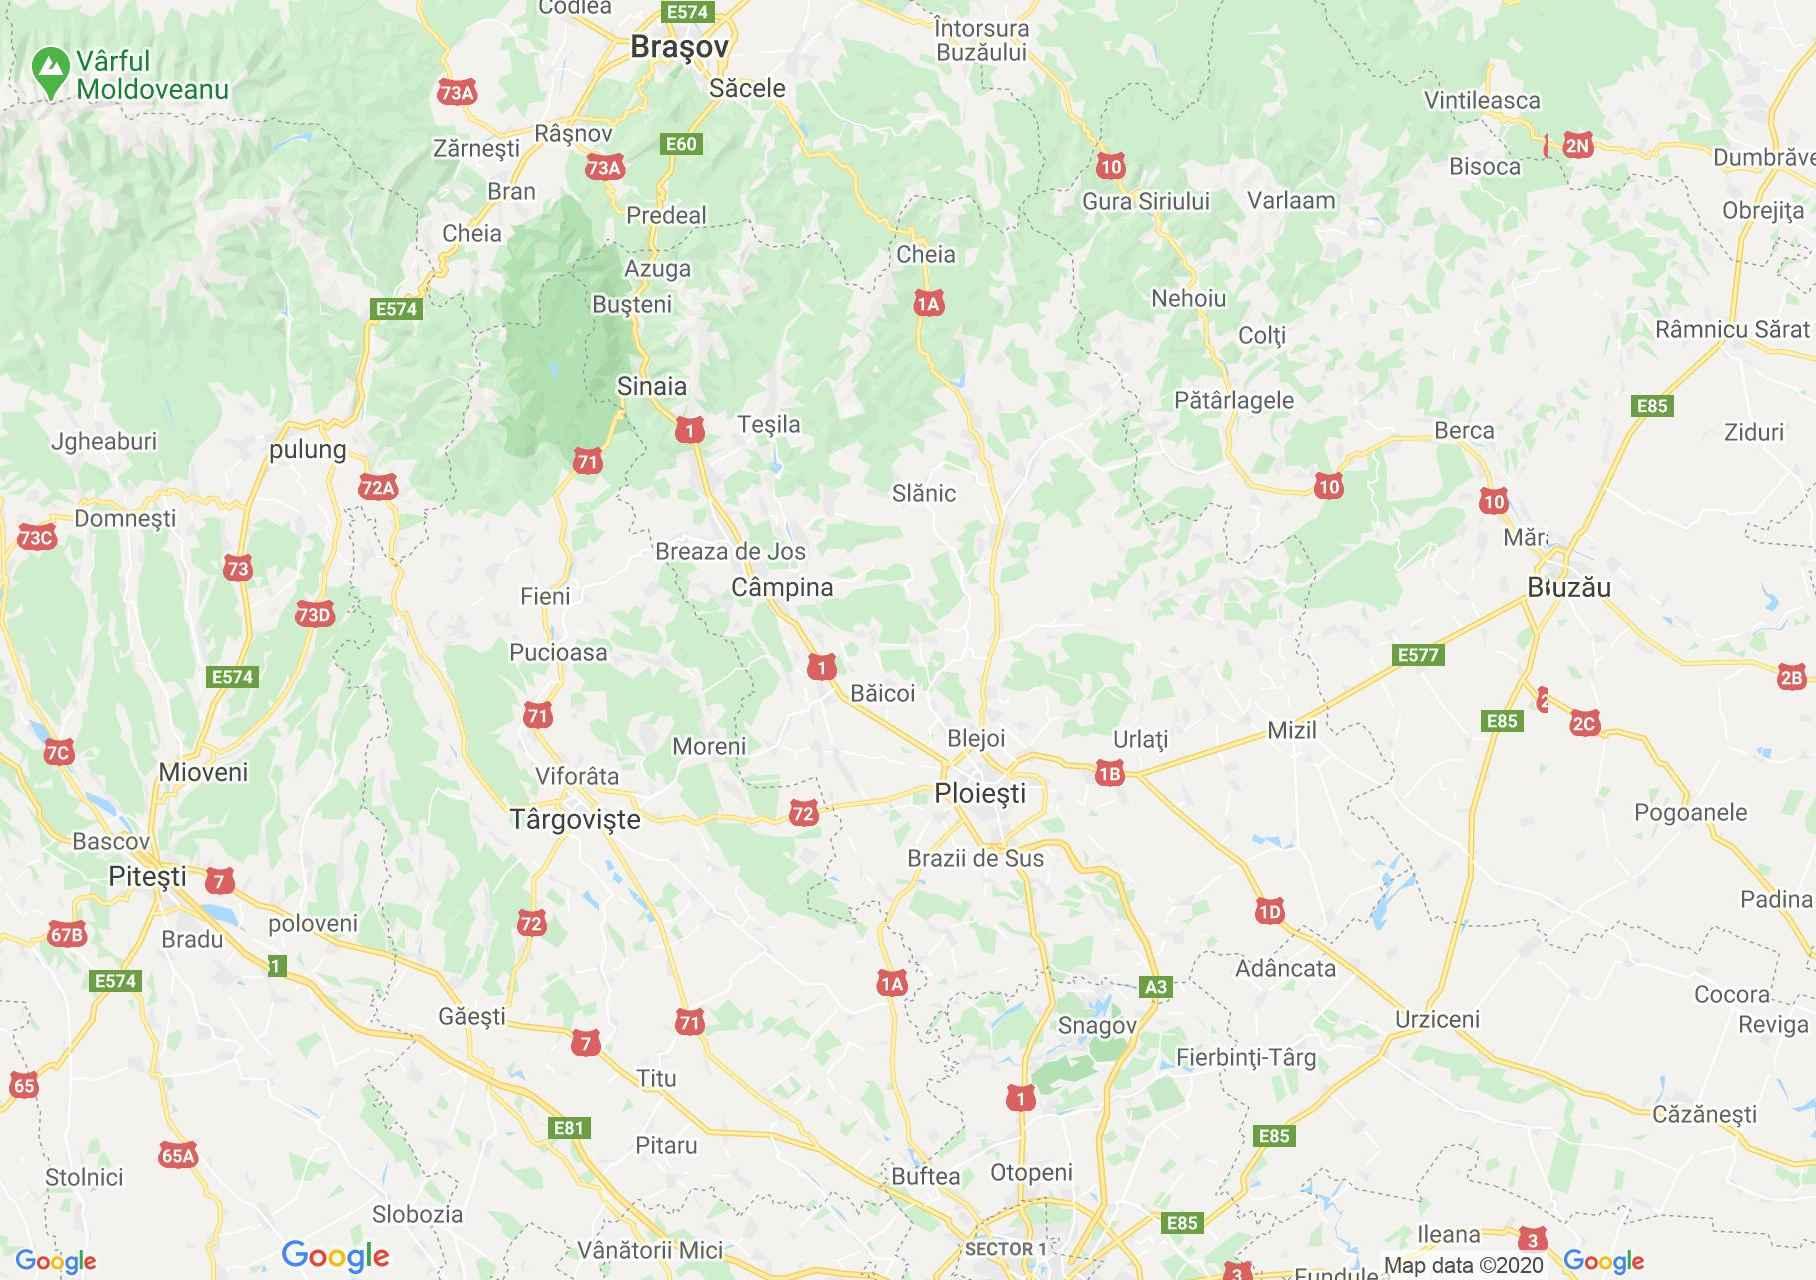 Prahova megye: (Ploiesti) interaktív turista térképe.